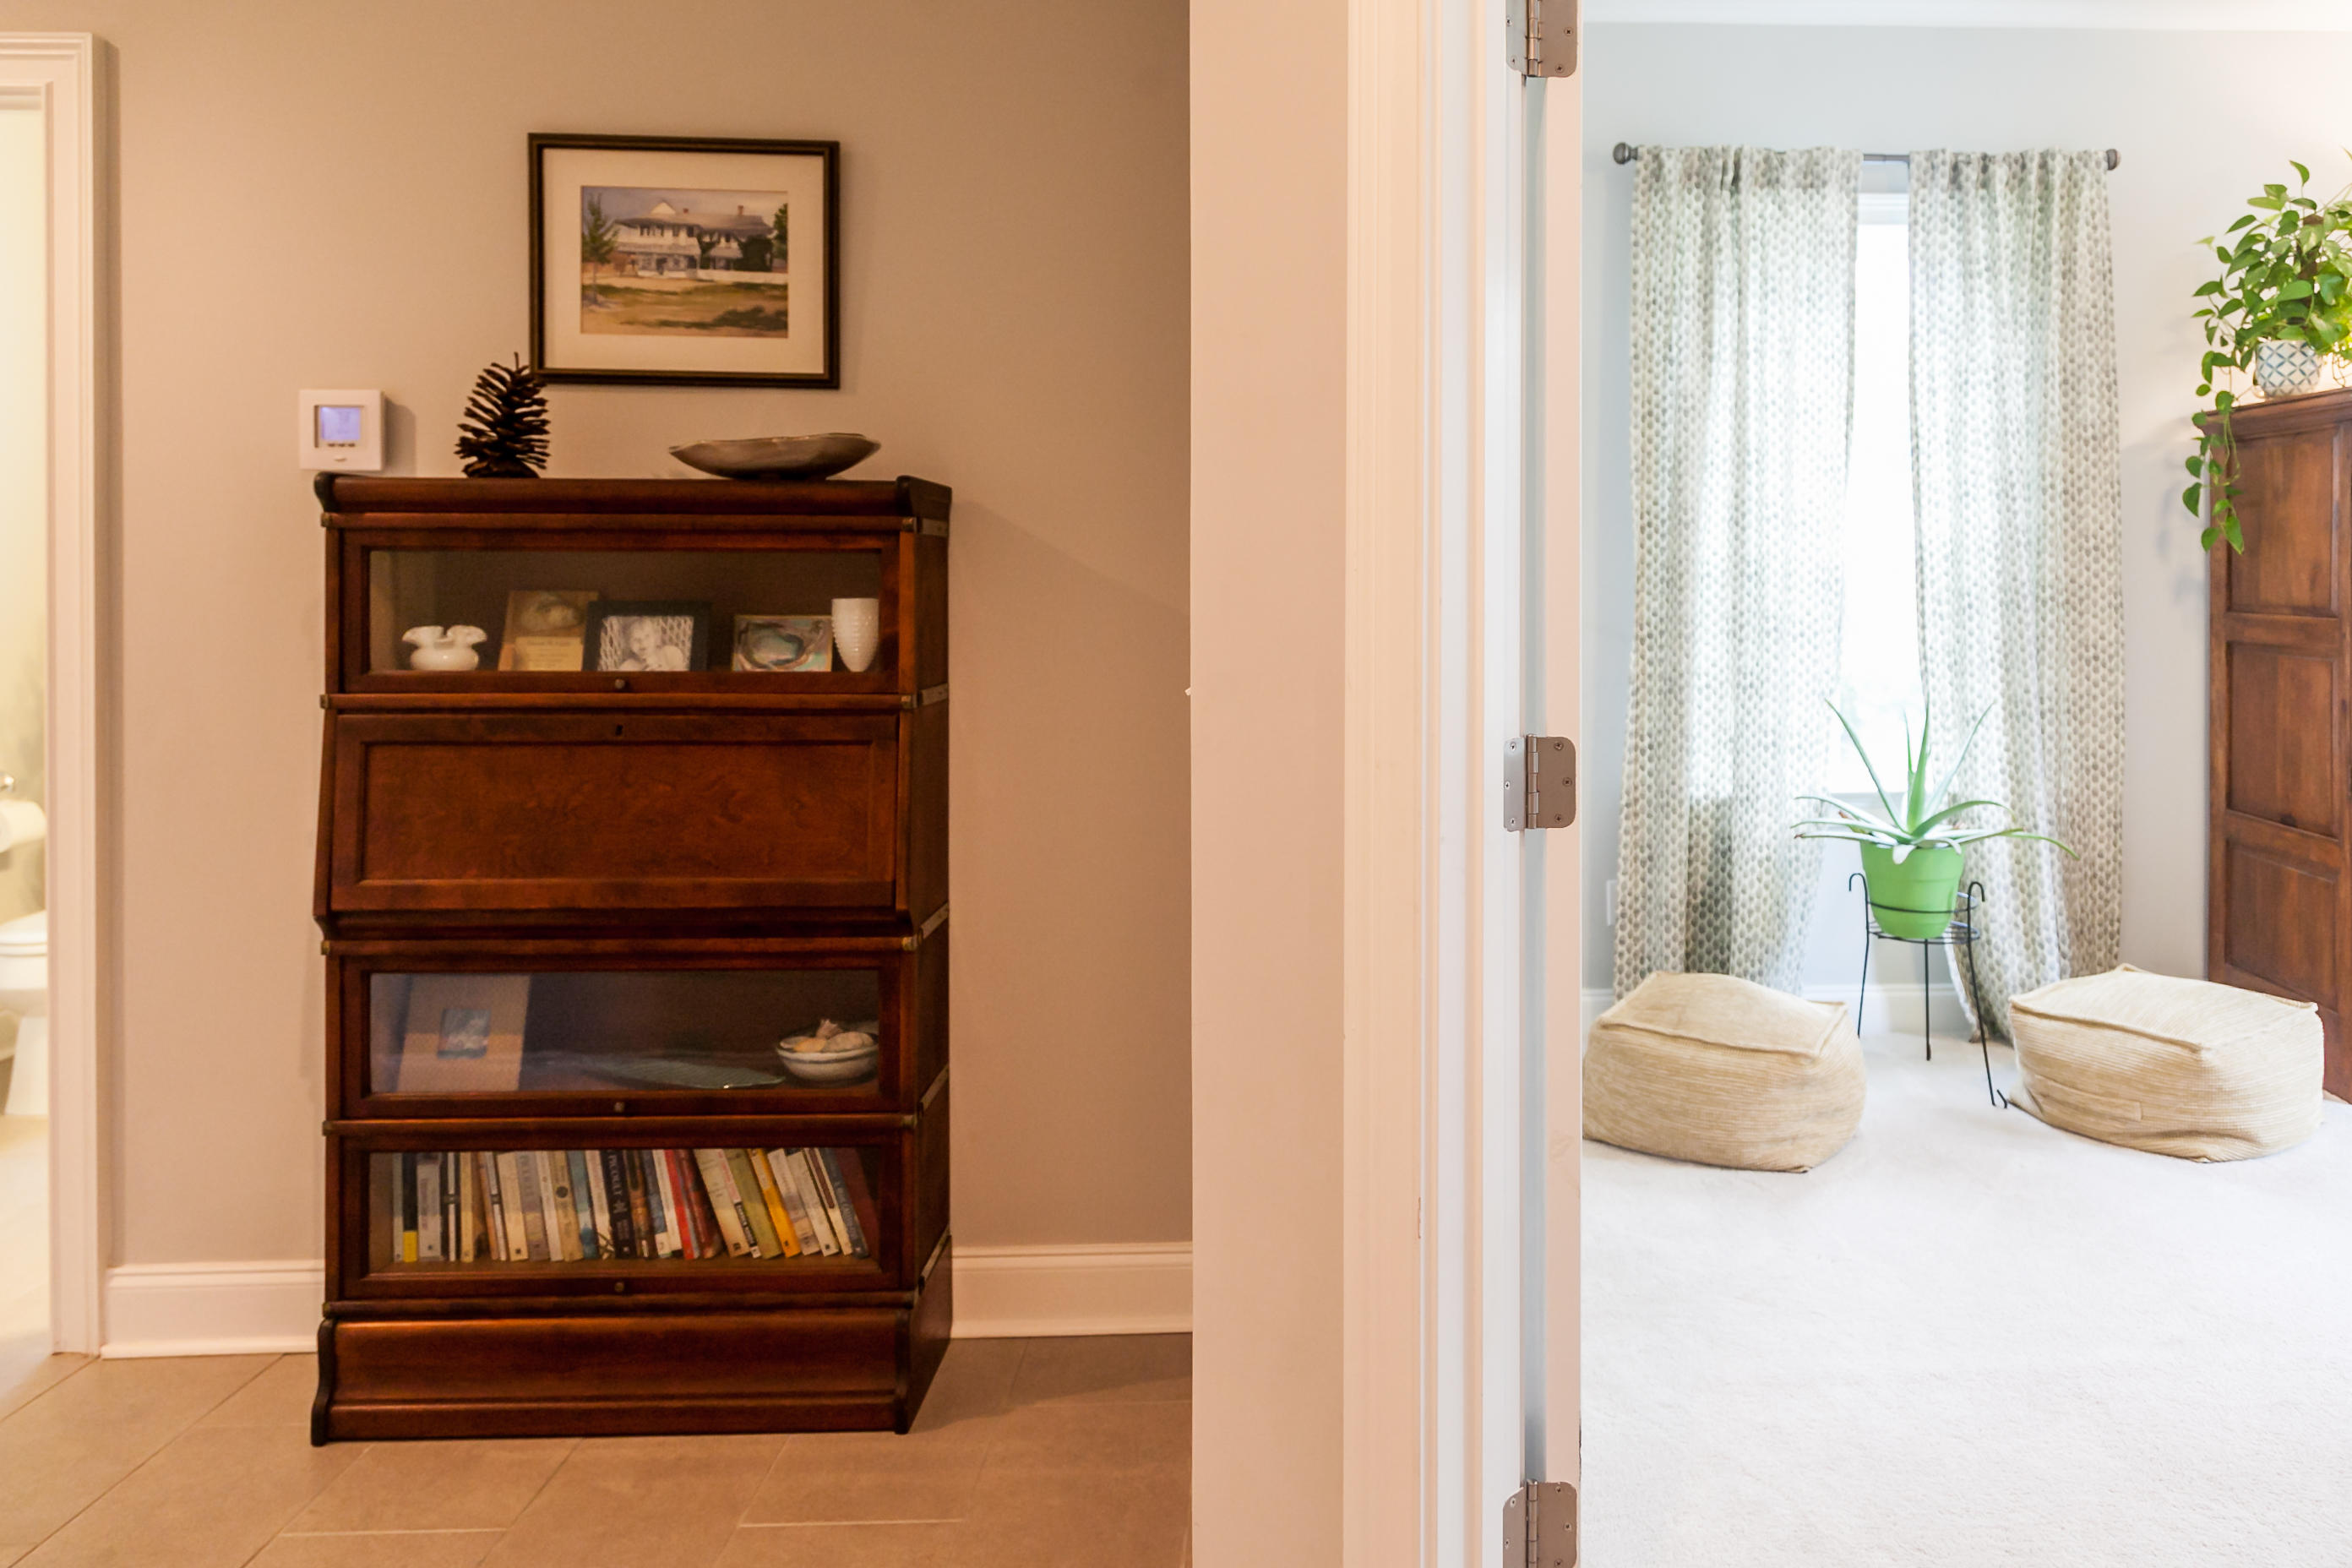 Whitesides Park Homes For Sale - 1319 Myrick, Mount Pleasant, SC - 0